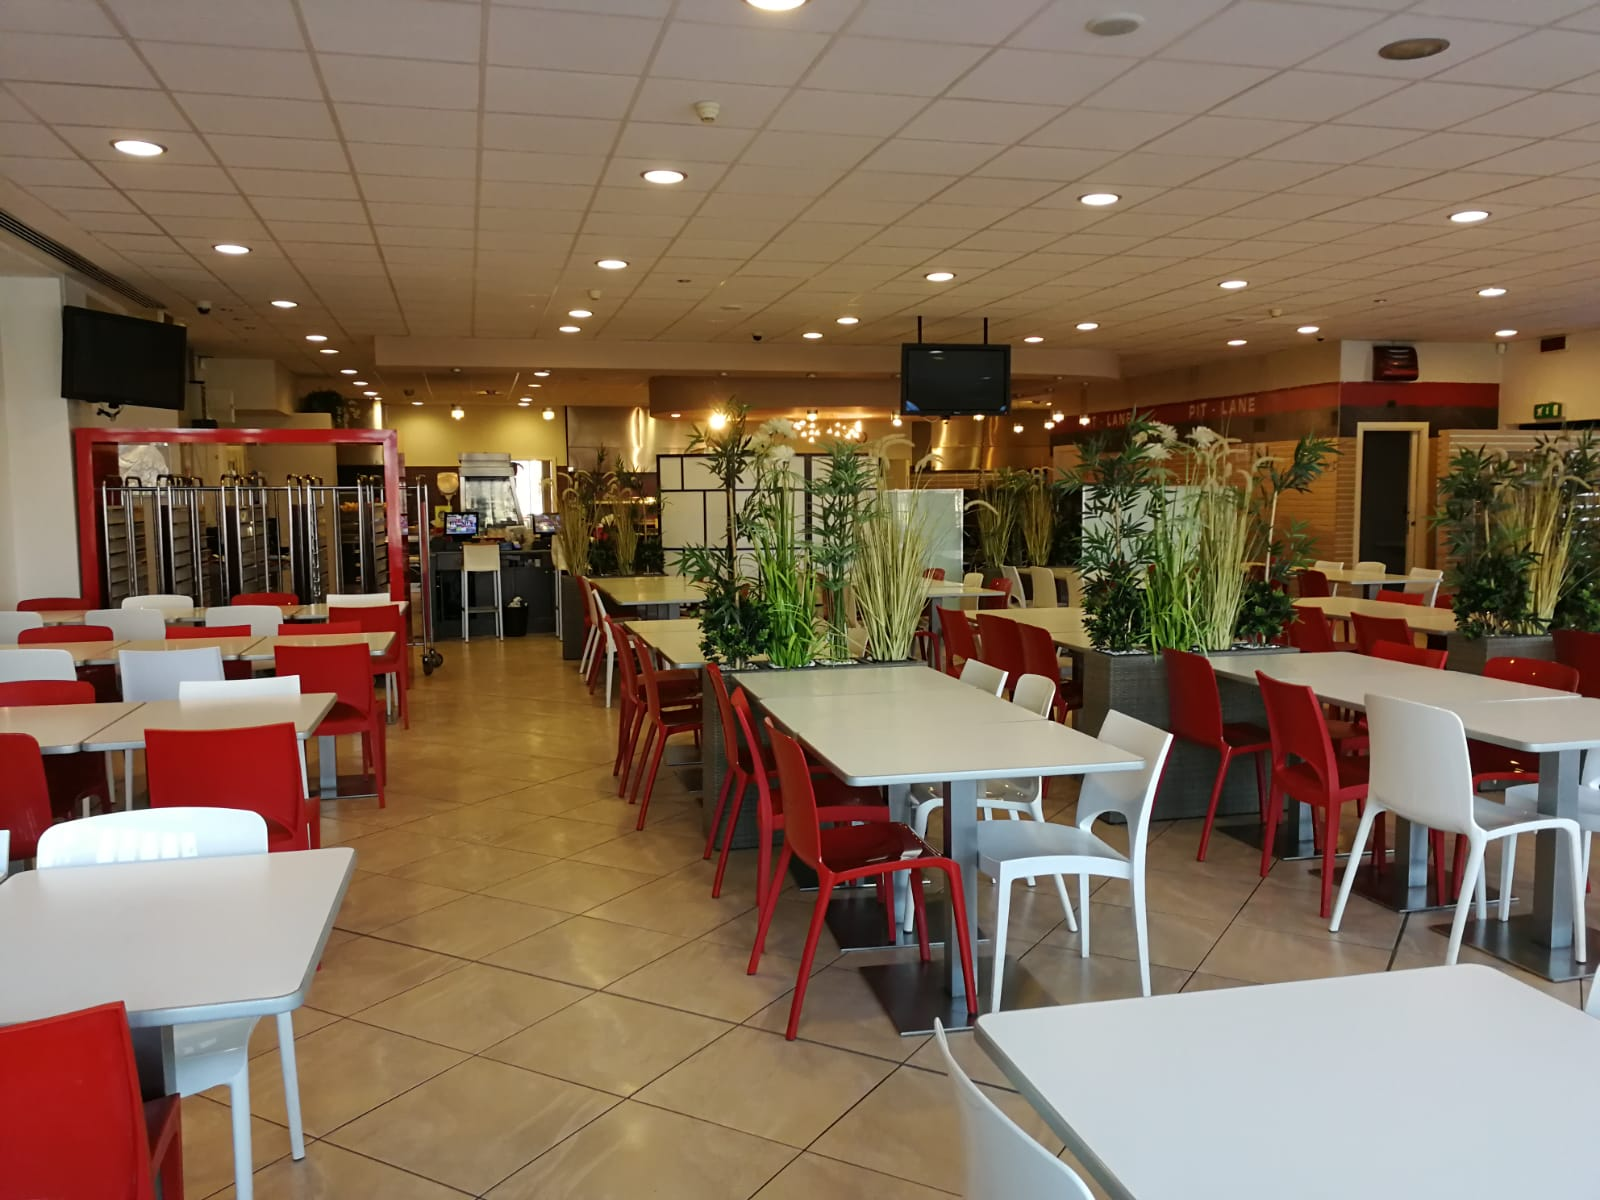 ristorante pit lane